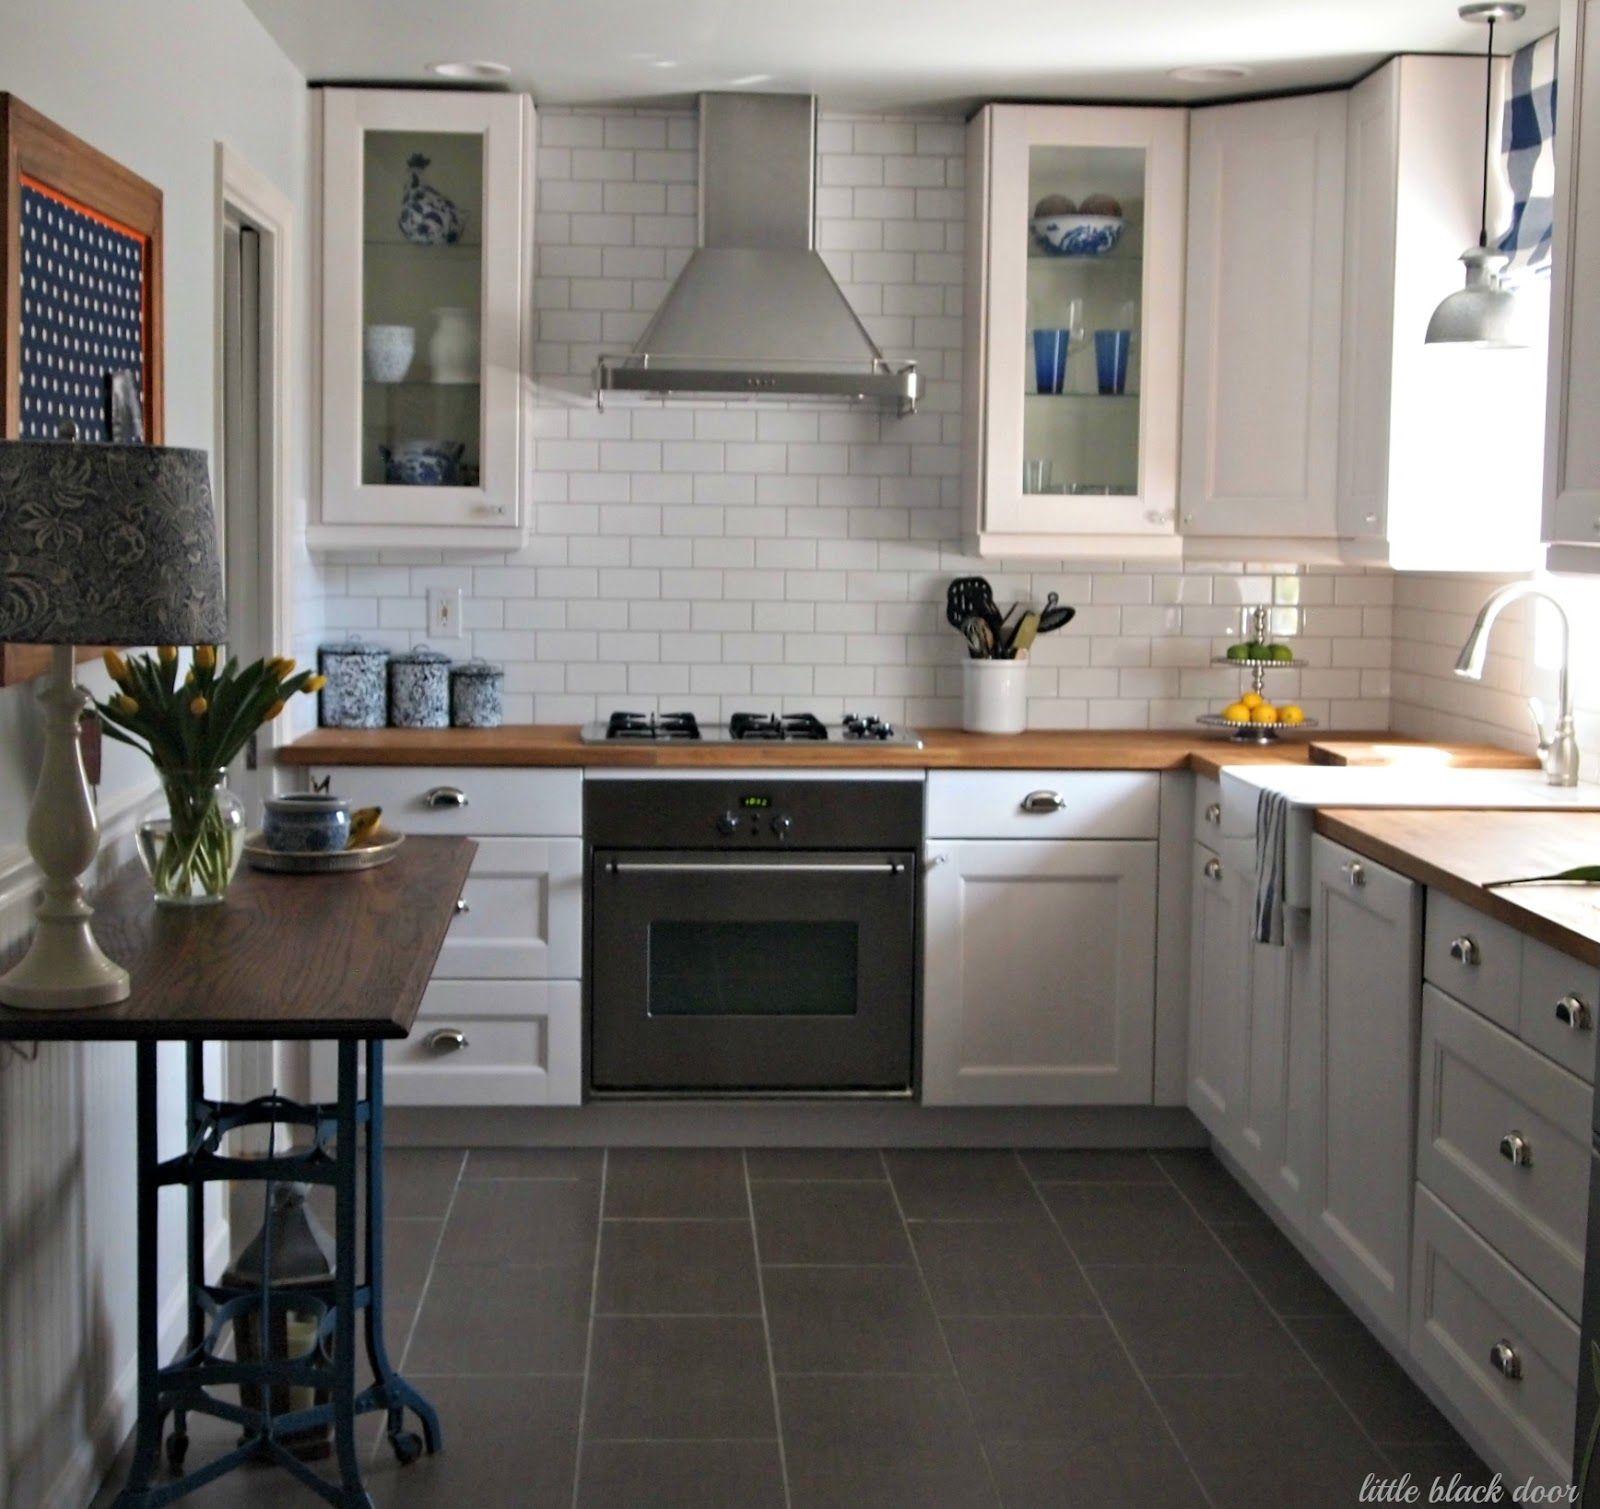 Ikea Farmhouse Kitchen Kitchens Pinterest Kitchen Layout Kitchen Floor Plans Kitchen Designs Layout